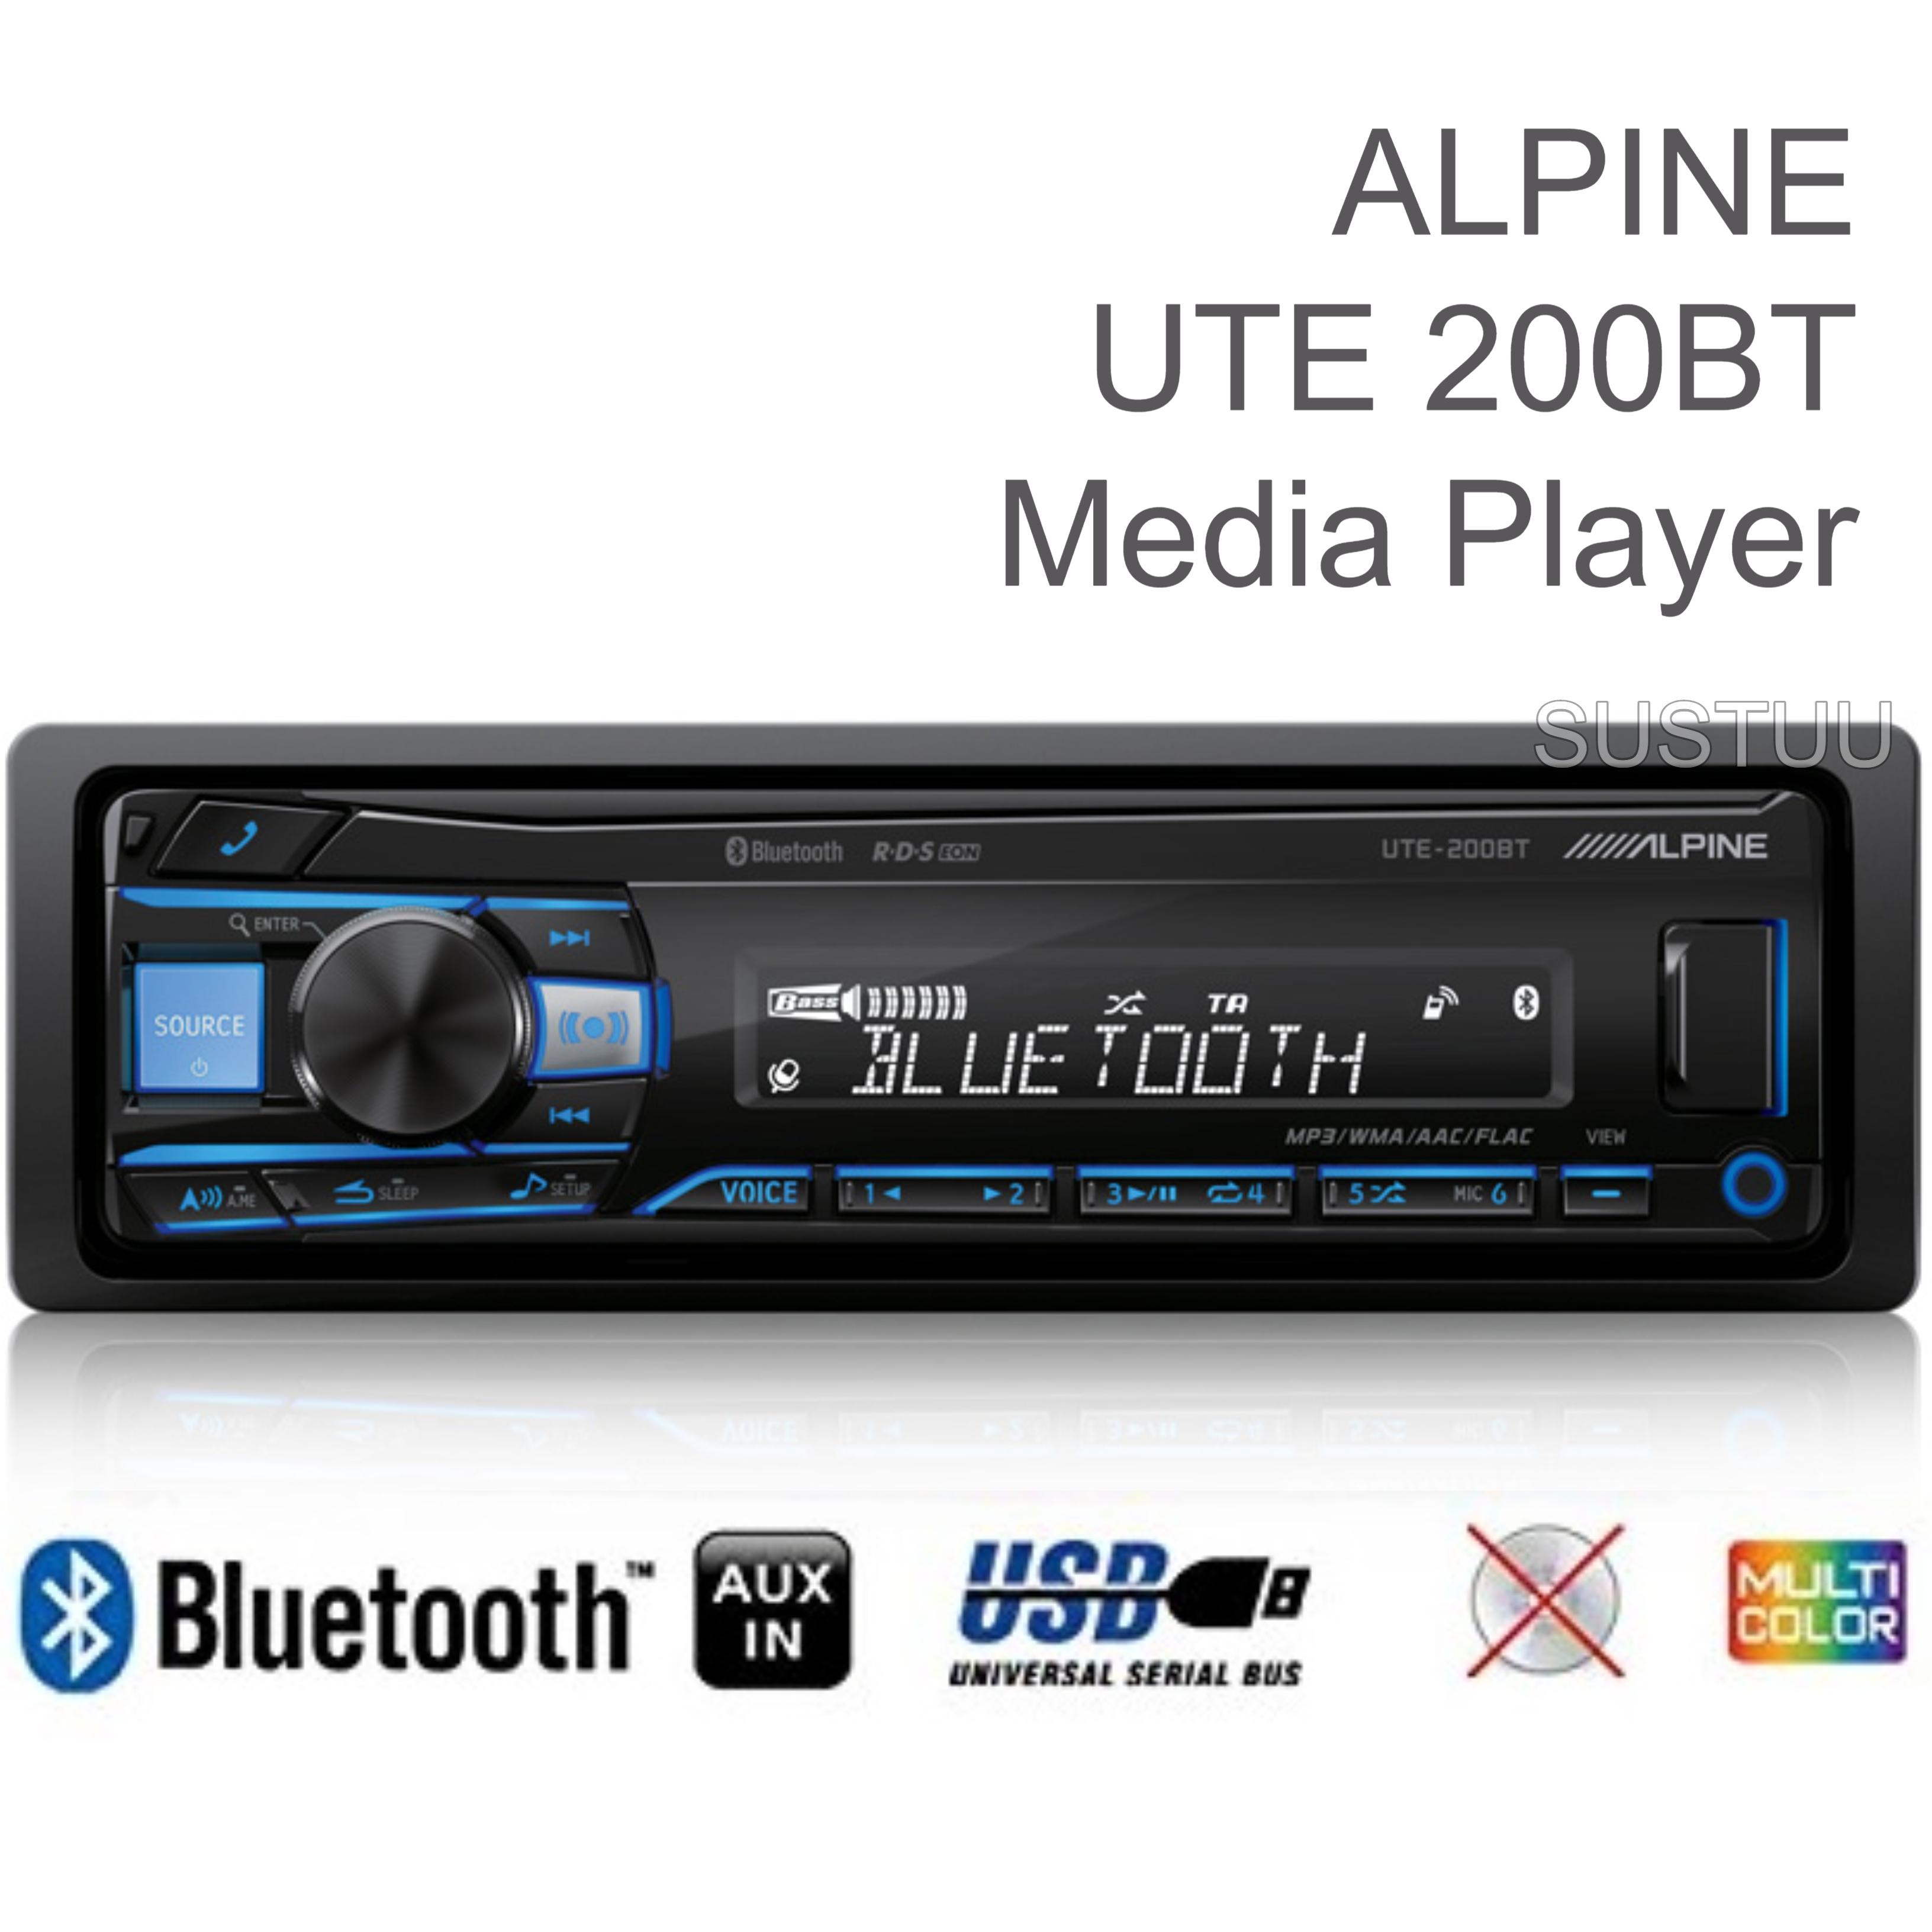 android alpine ute 200bt car stereo single din radio media rh sustuu com UTE-42BT Alpine Alpine 6 CD Player